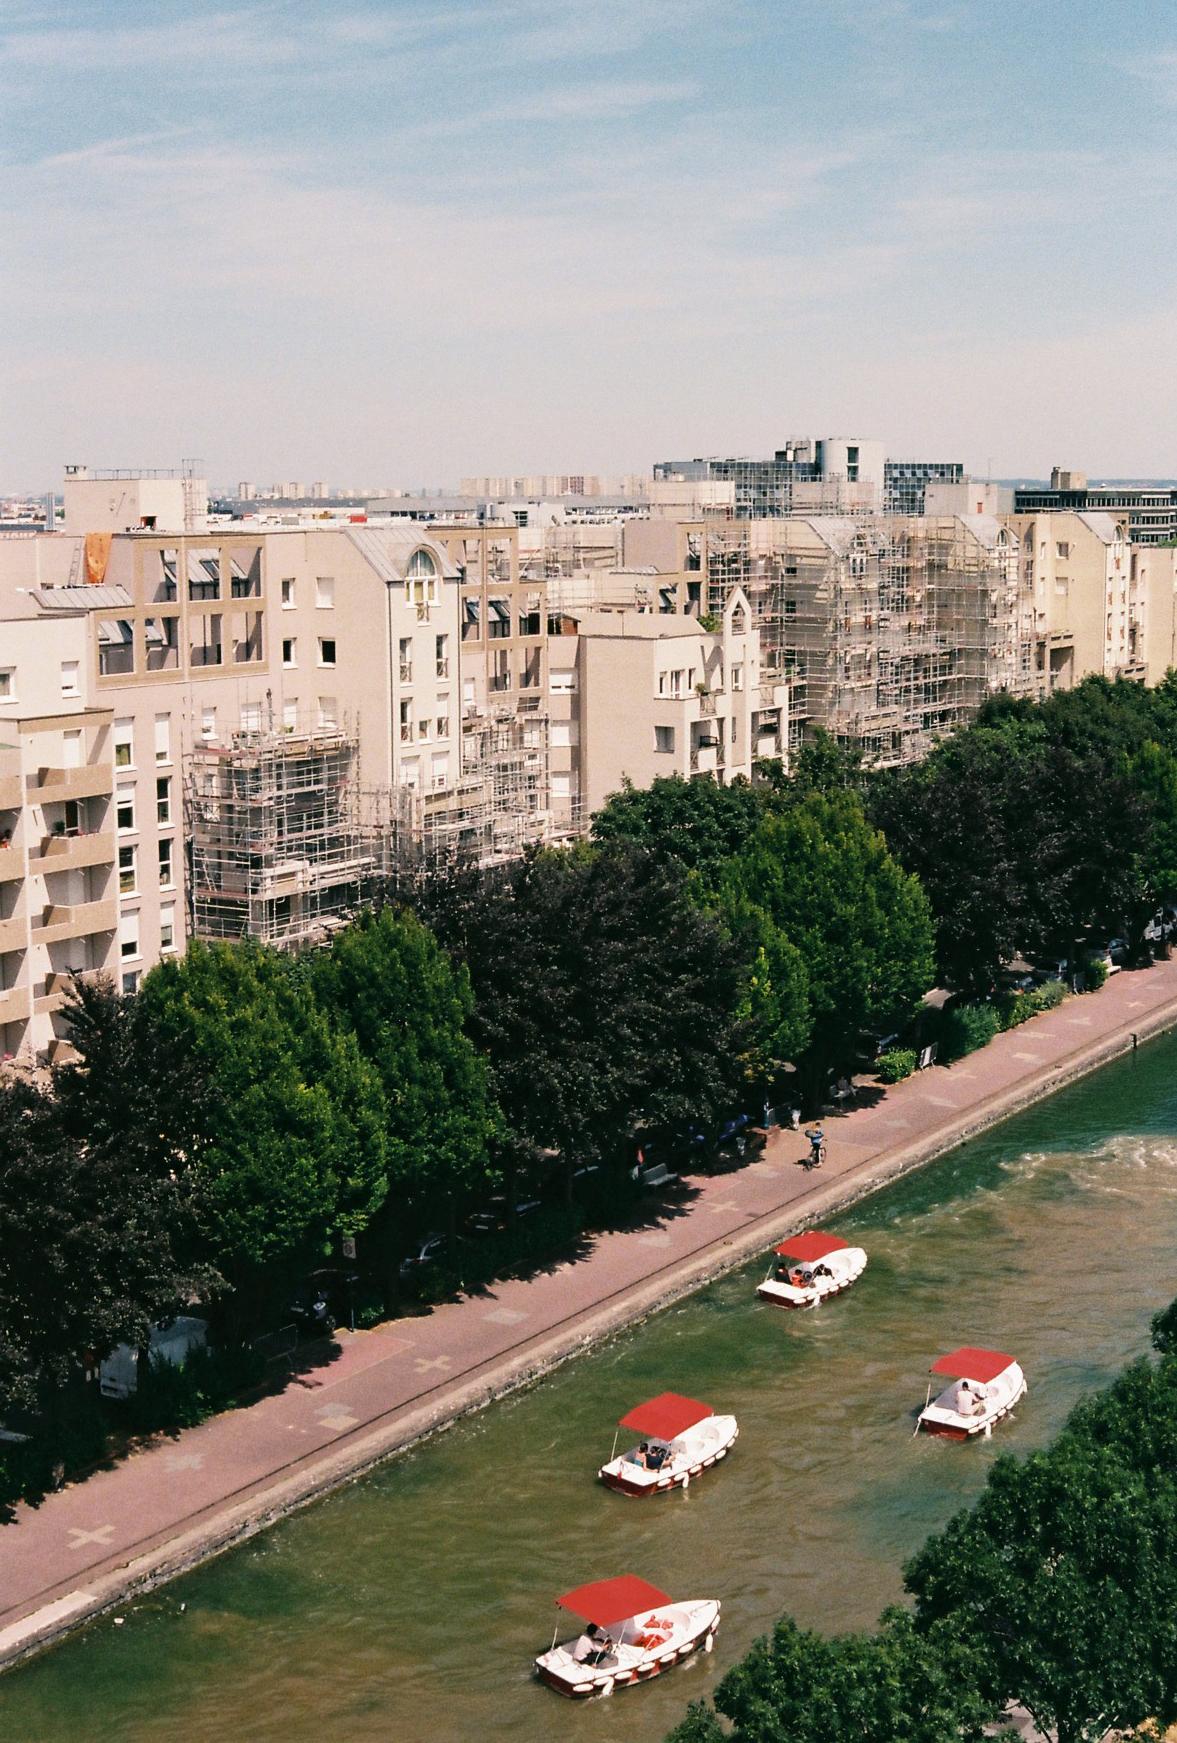 07_17_PARIS_018.JPG